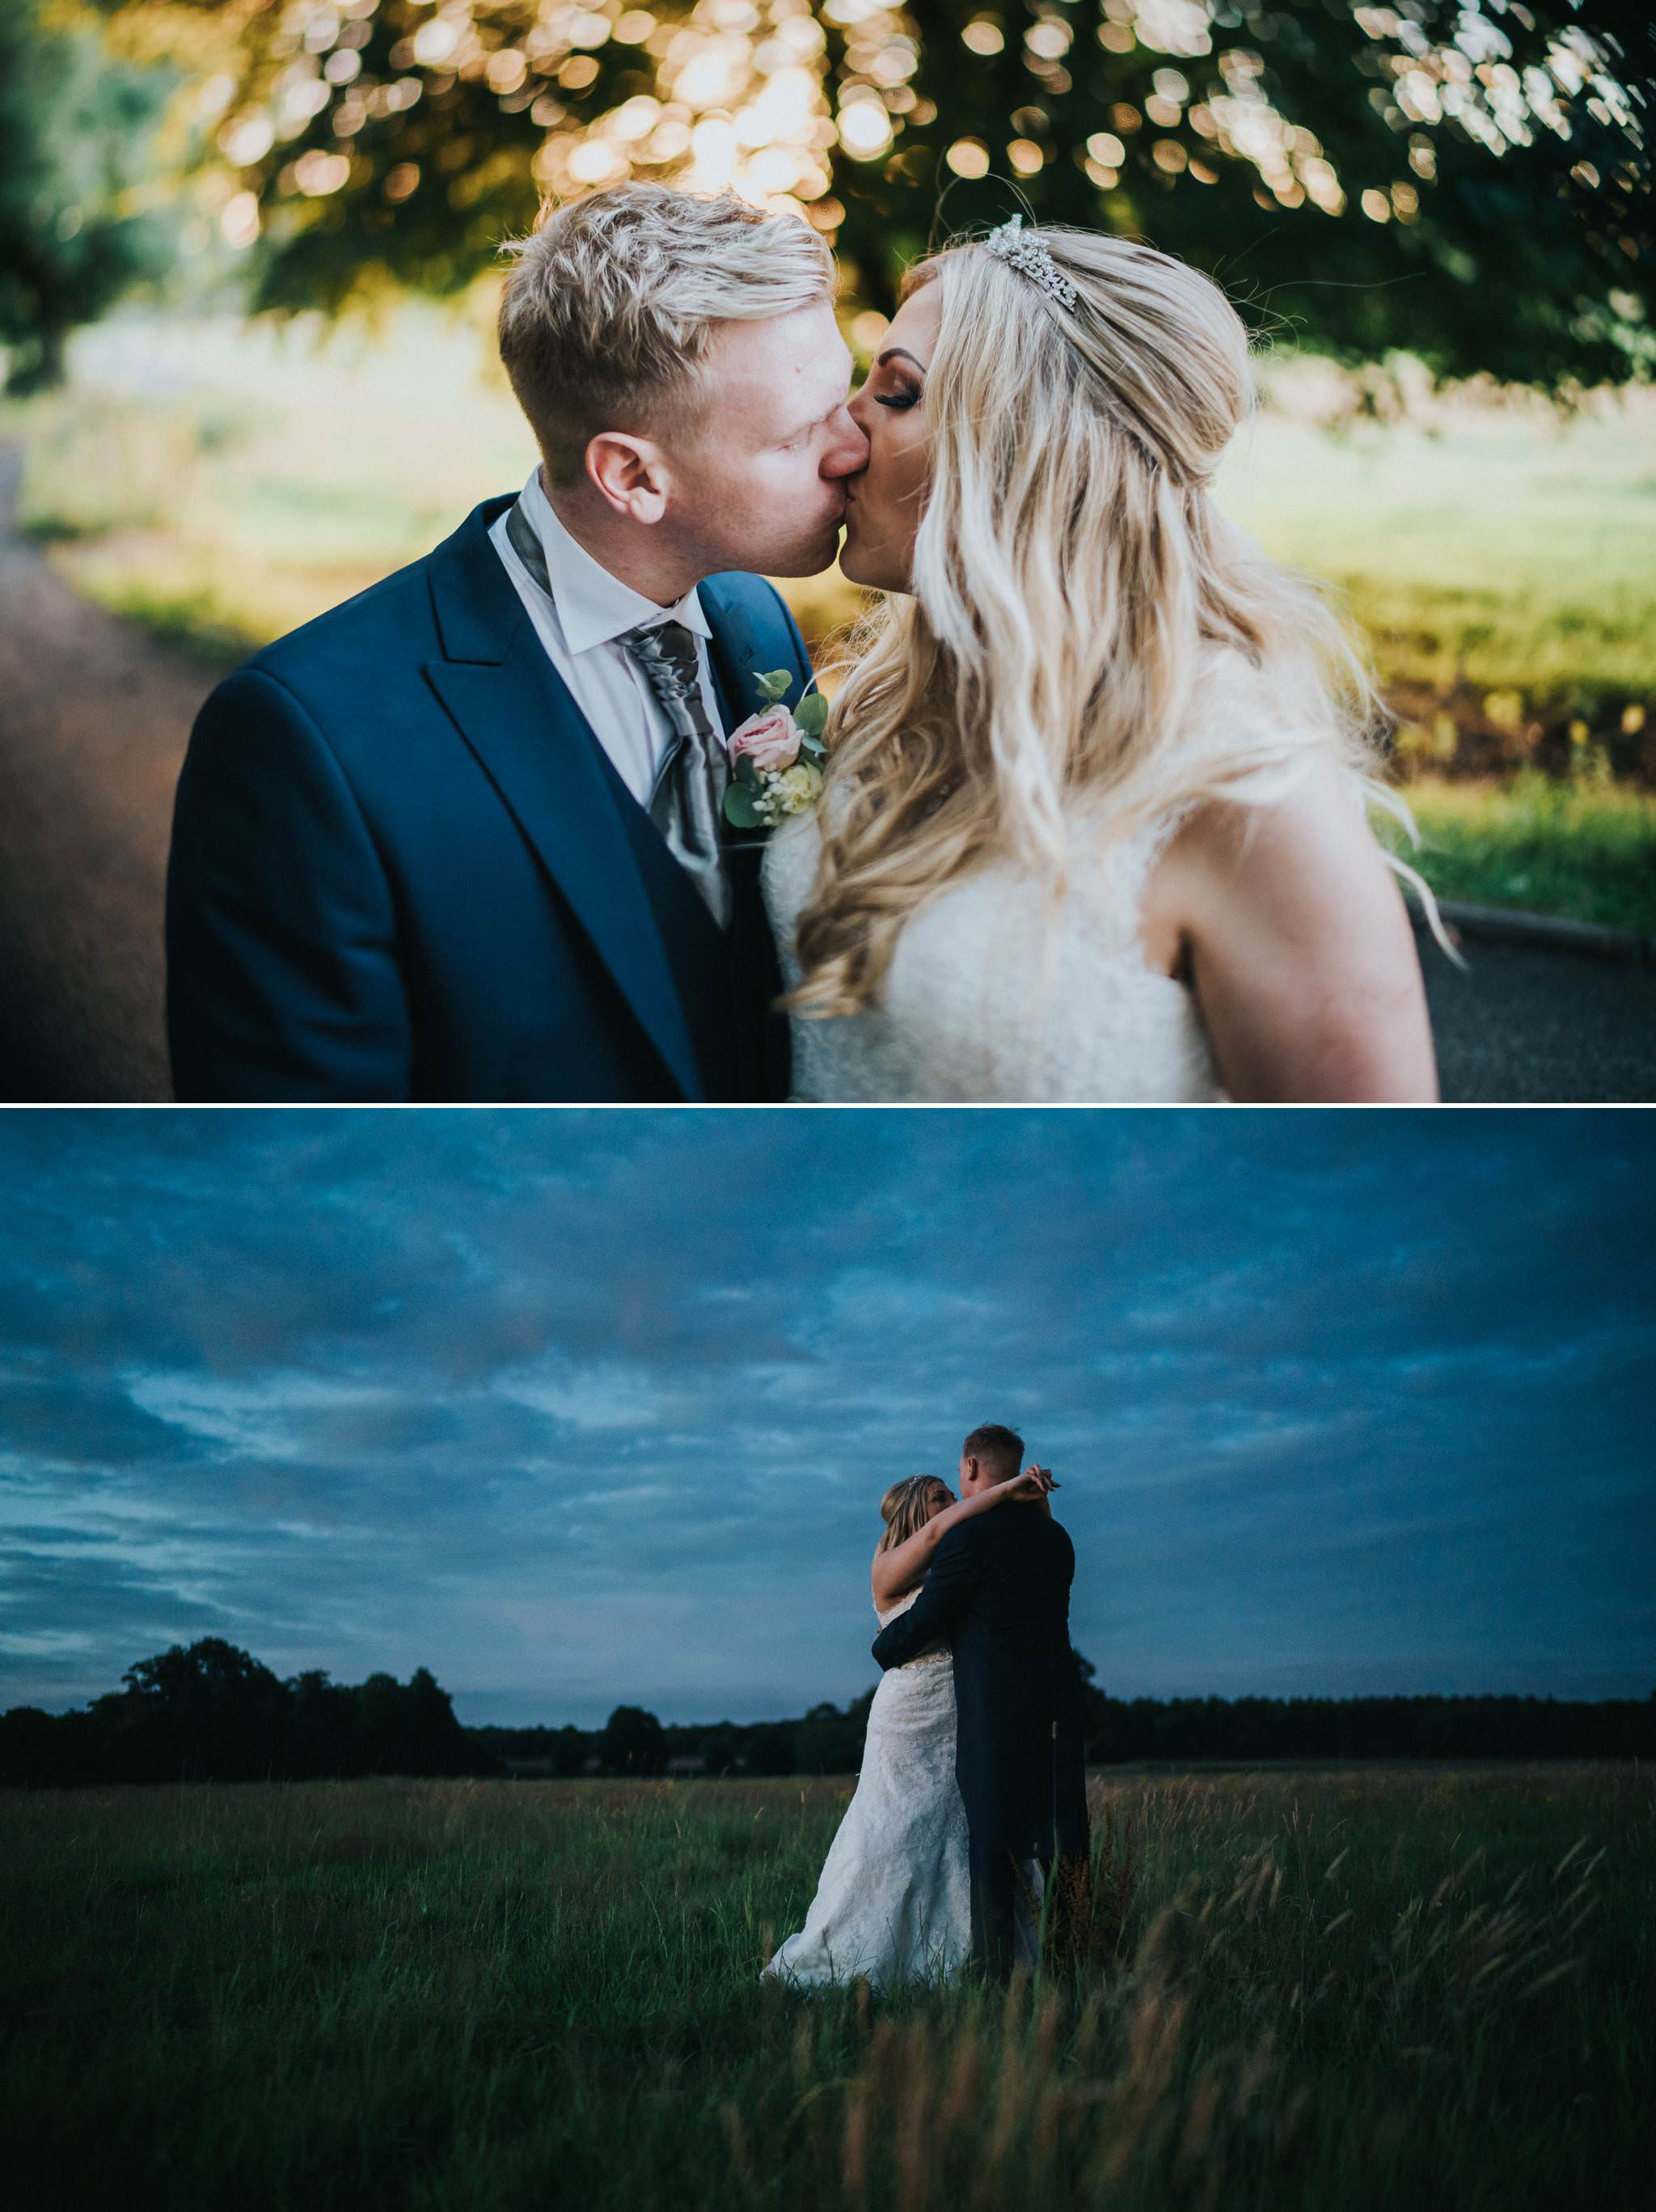 somerford-hall-wedding-photography 21.jpg